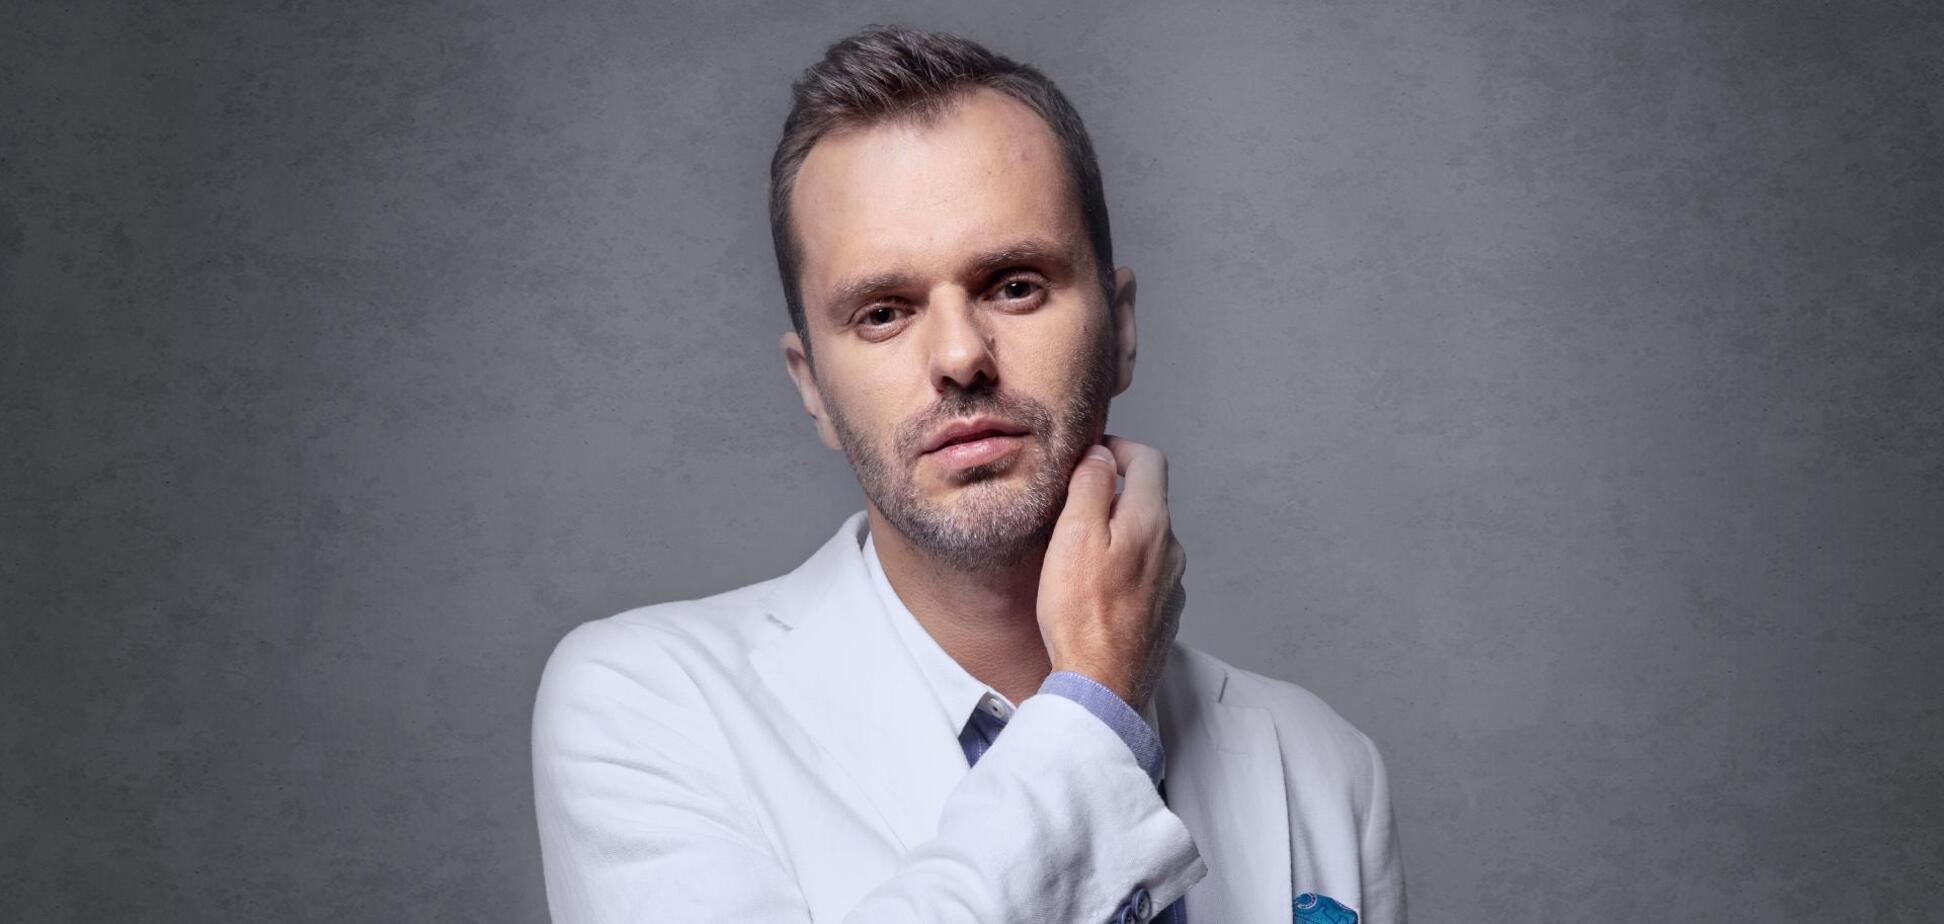 Євген Ковтуненко покинув шоу 'Холостячка'